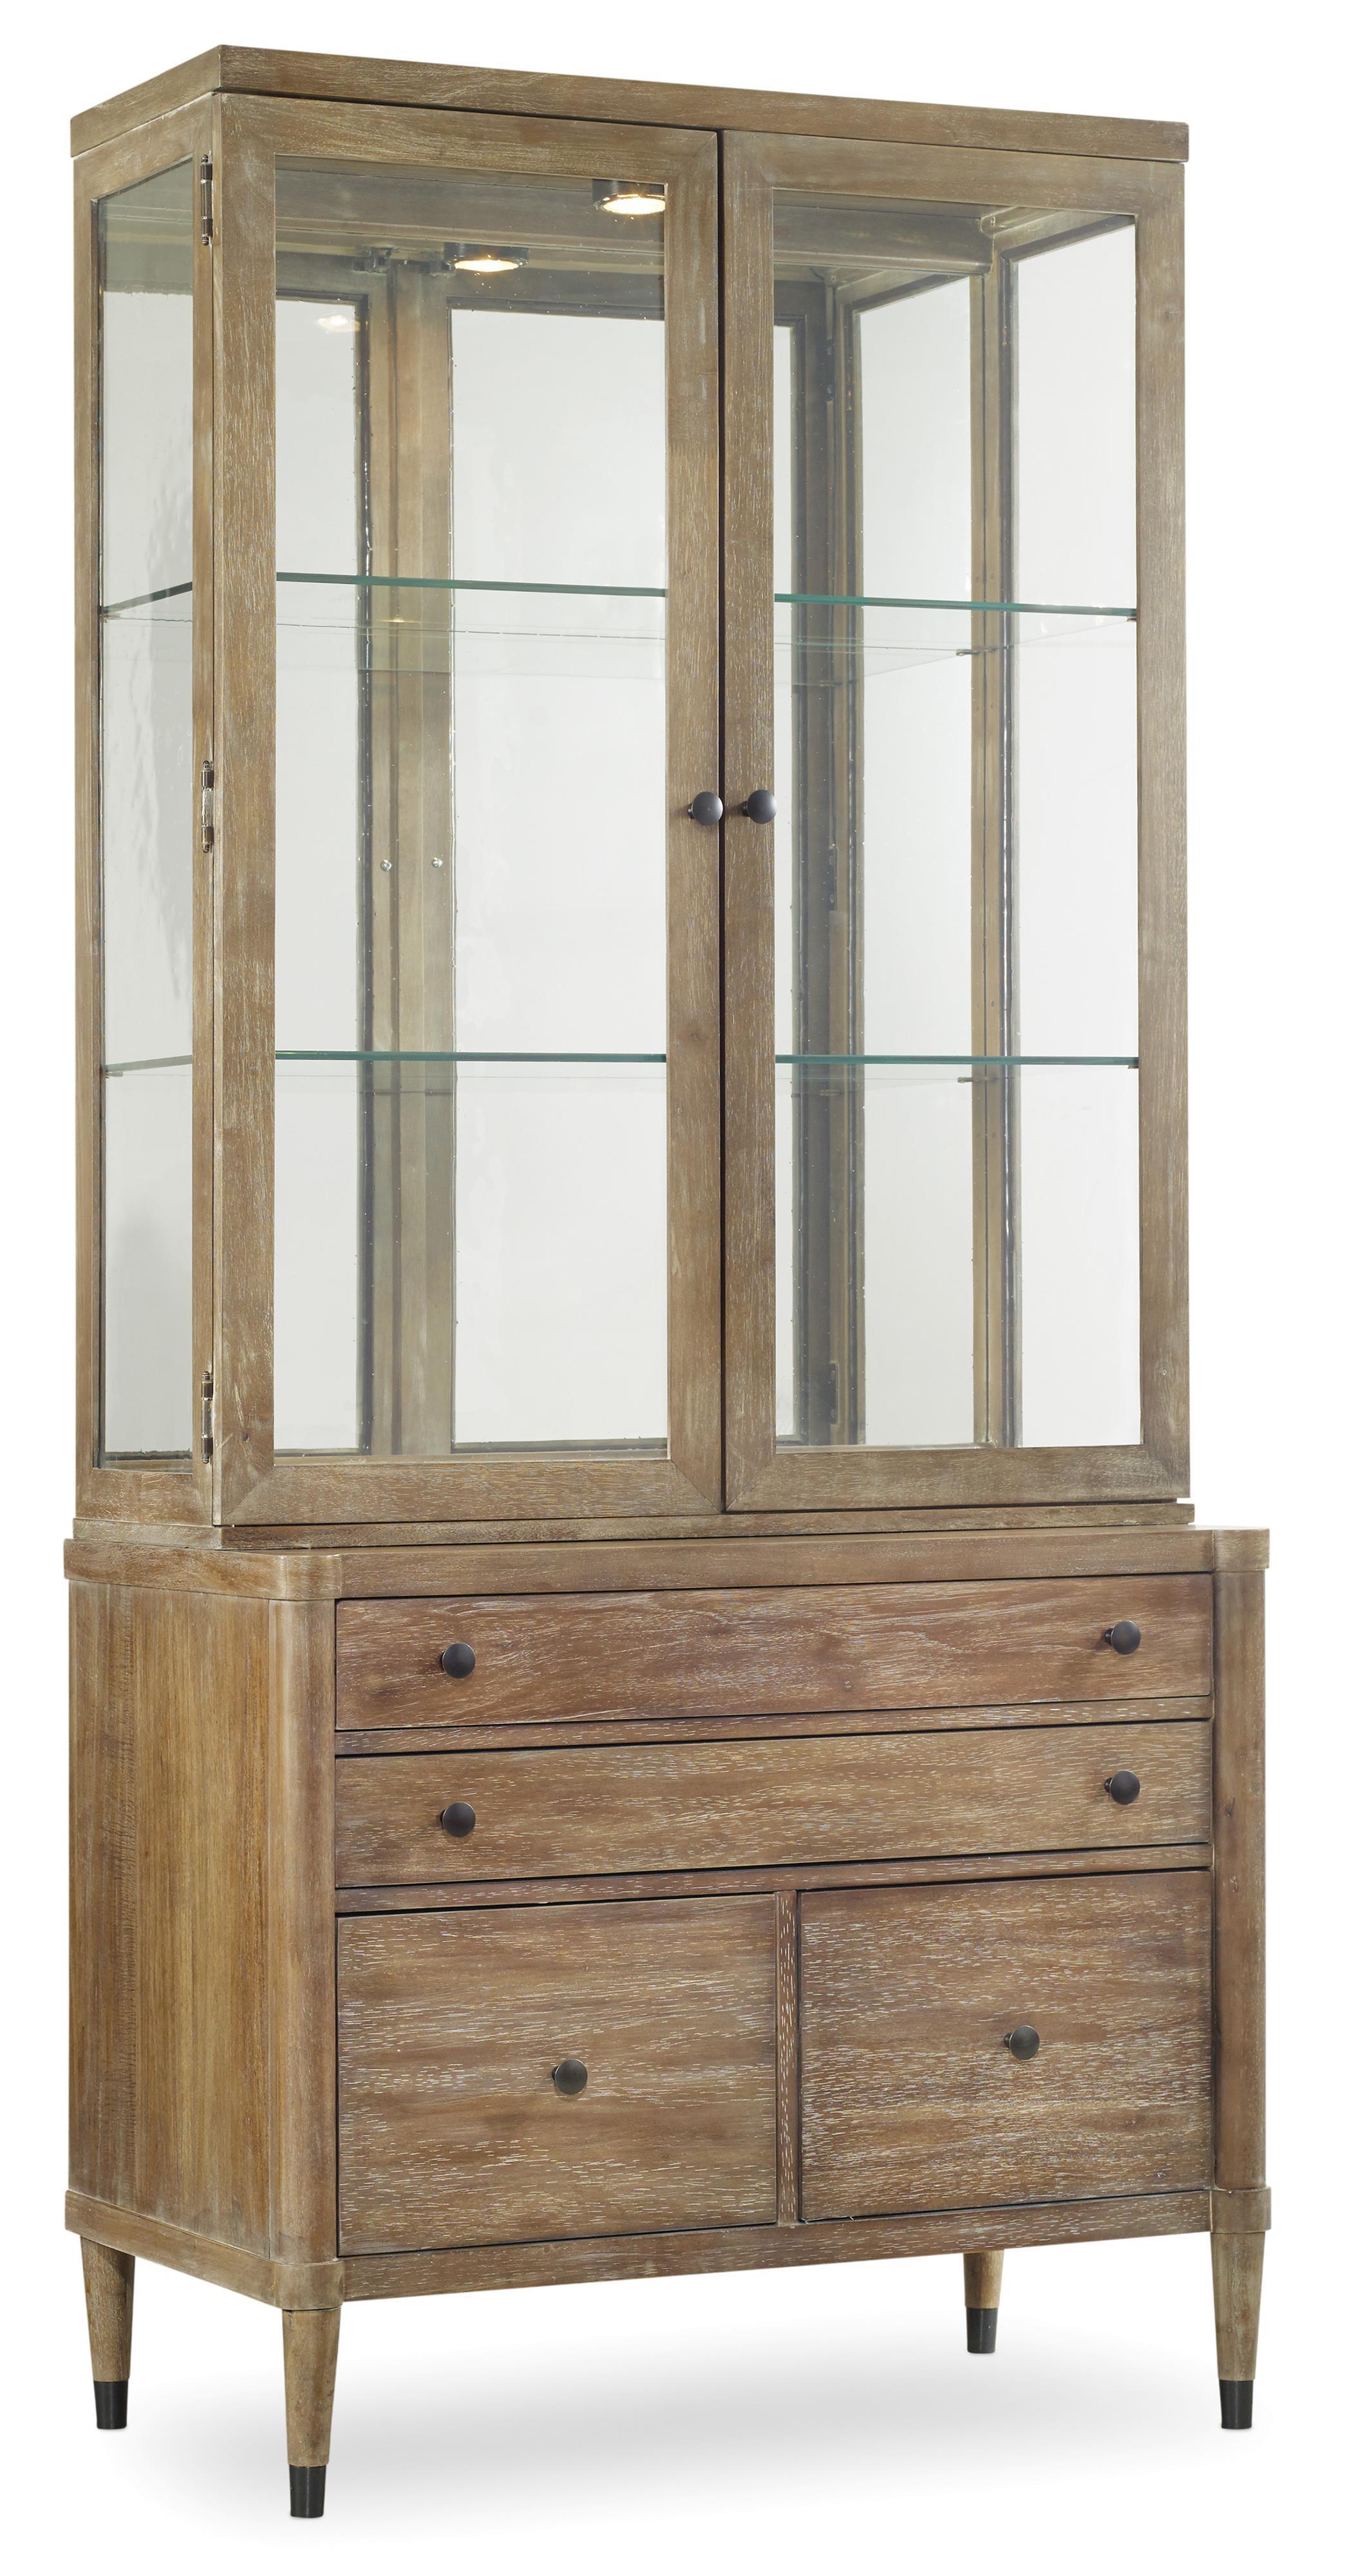 Hooker Furniture Studio 7H Utility Credenza with Hutch - Item Number: 5382-75900+1